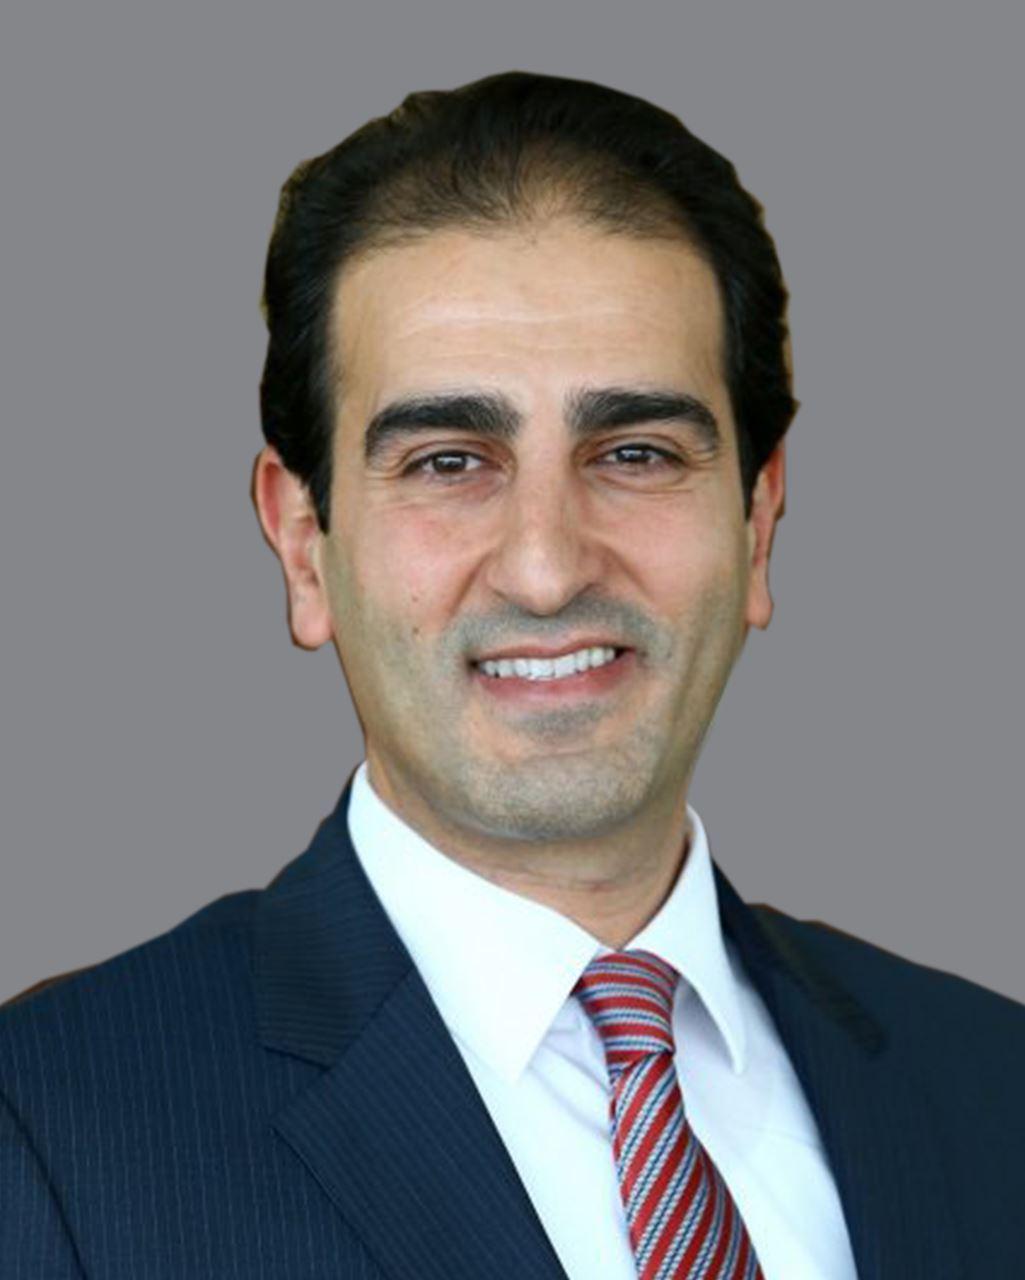 Canadian Business Council Abu Dhabi - Board & Executive Team